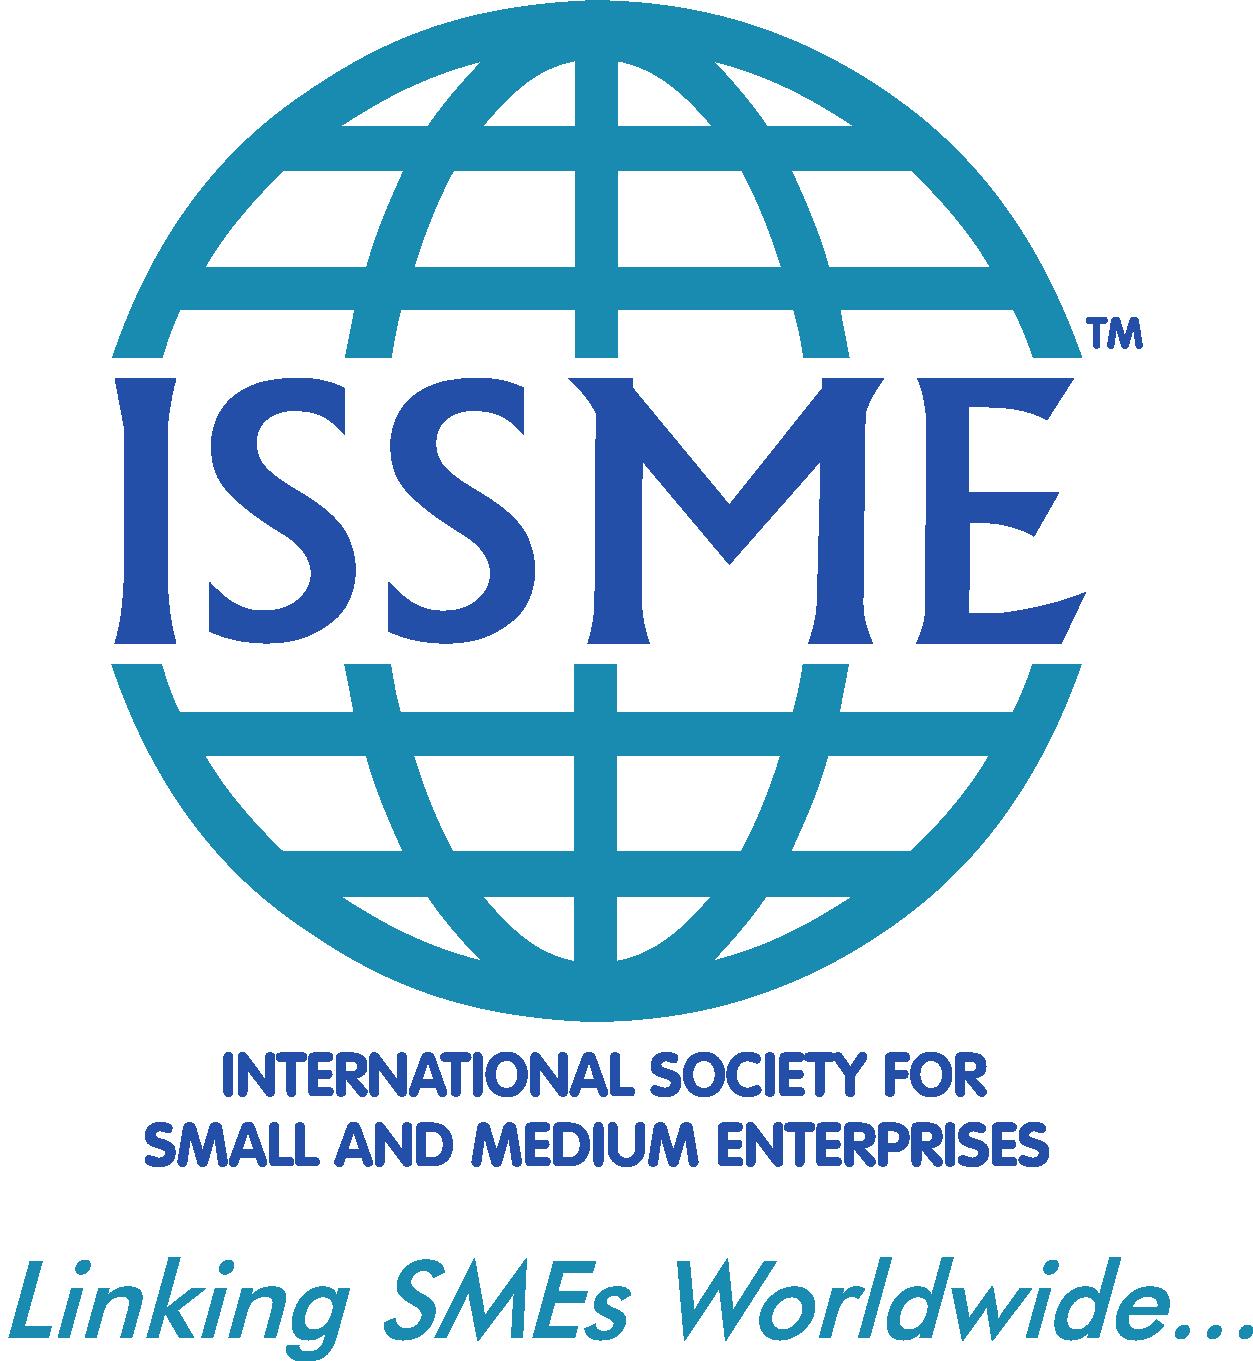 logo for International Society for Small and Medium Enterprises